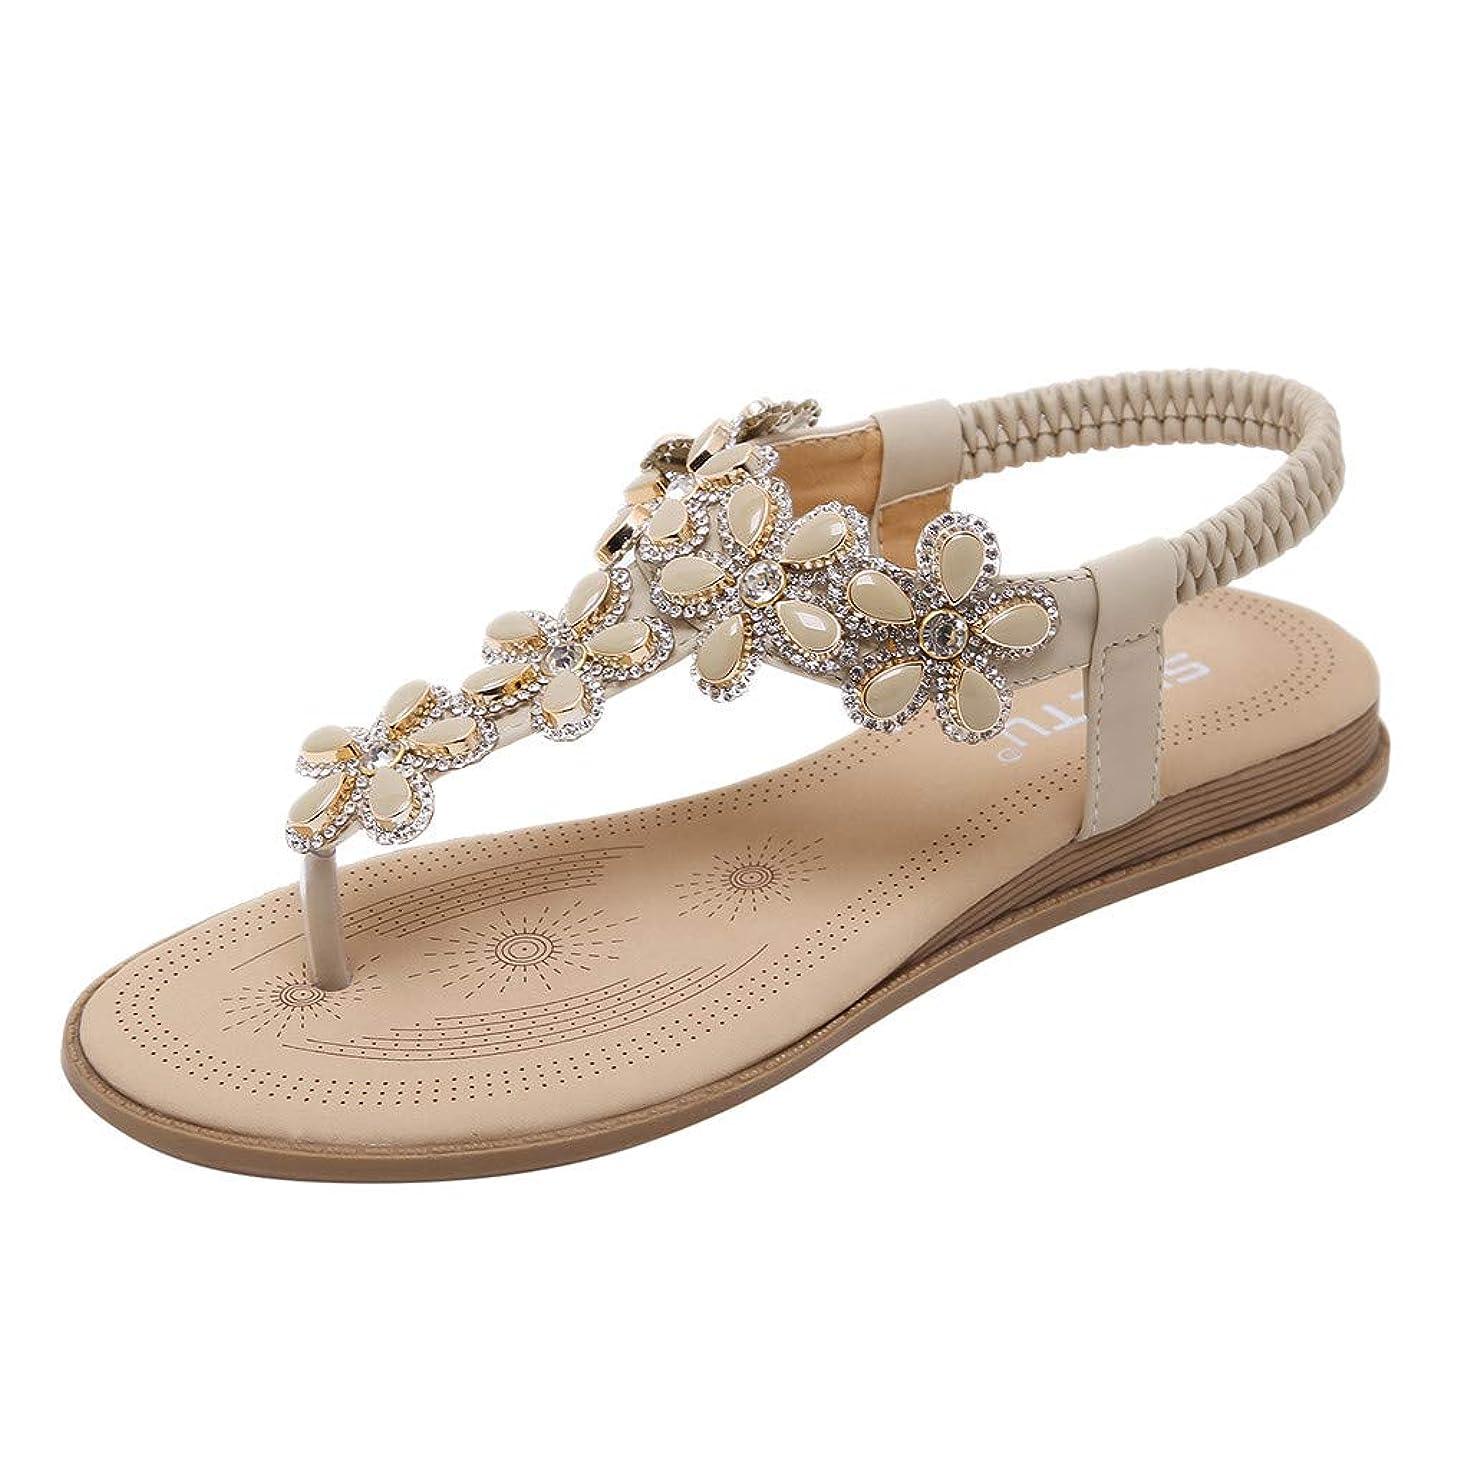 Sunhusing Ladies' Flip Flops Feet Bohemian Style Flowers Comfortable Elastic Band Flat Sandals Roman Shoes